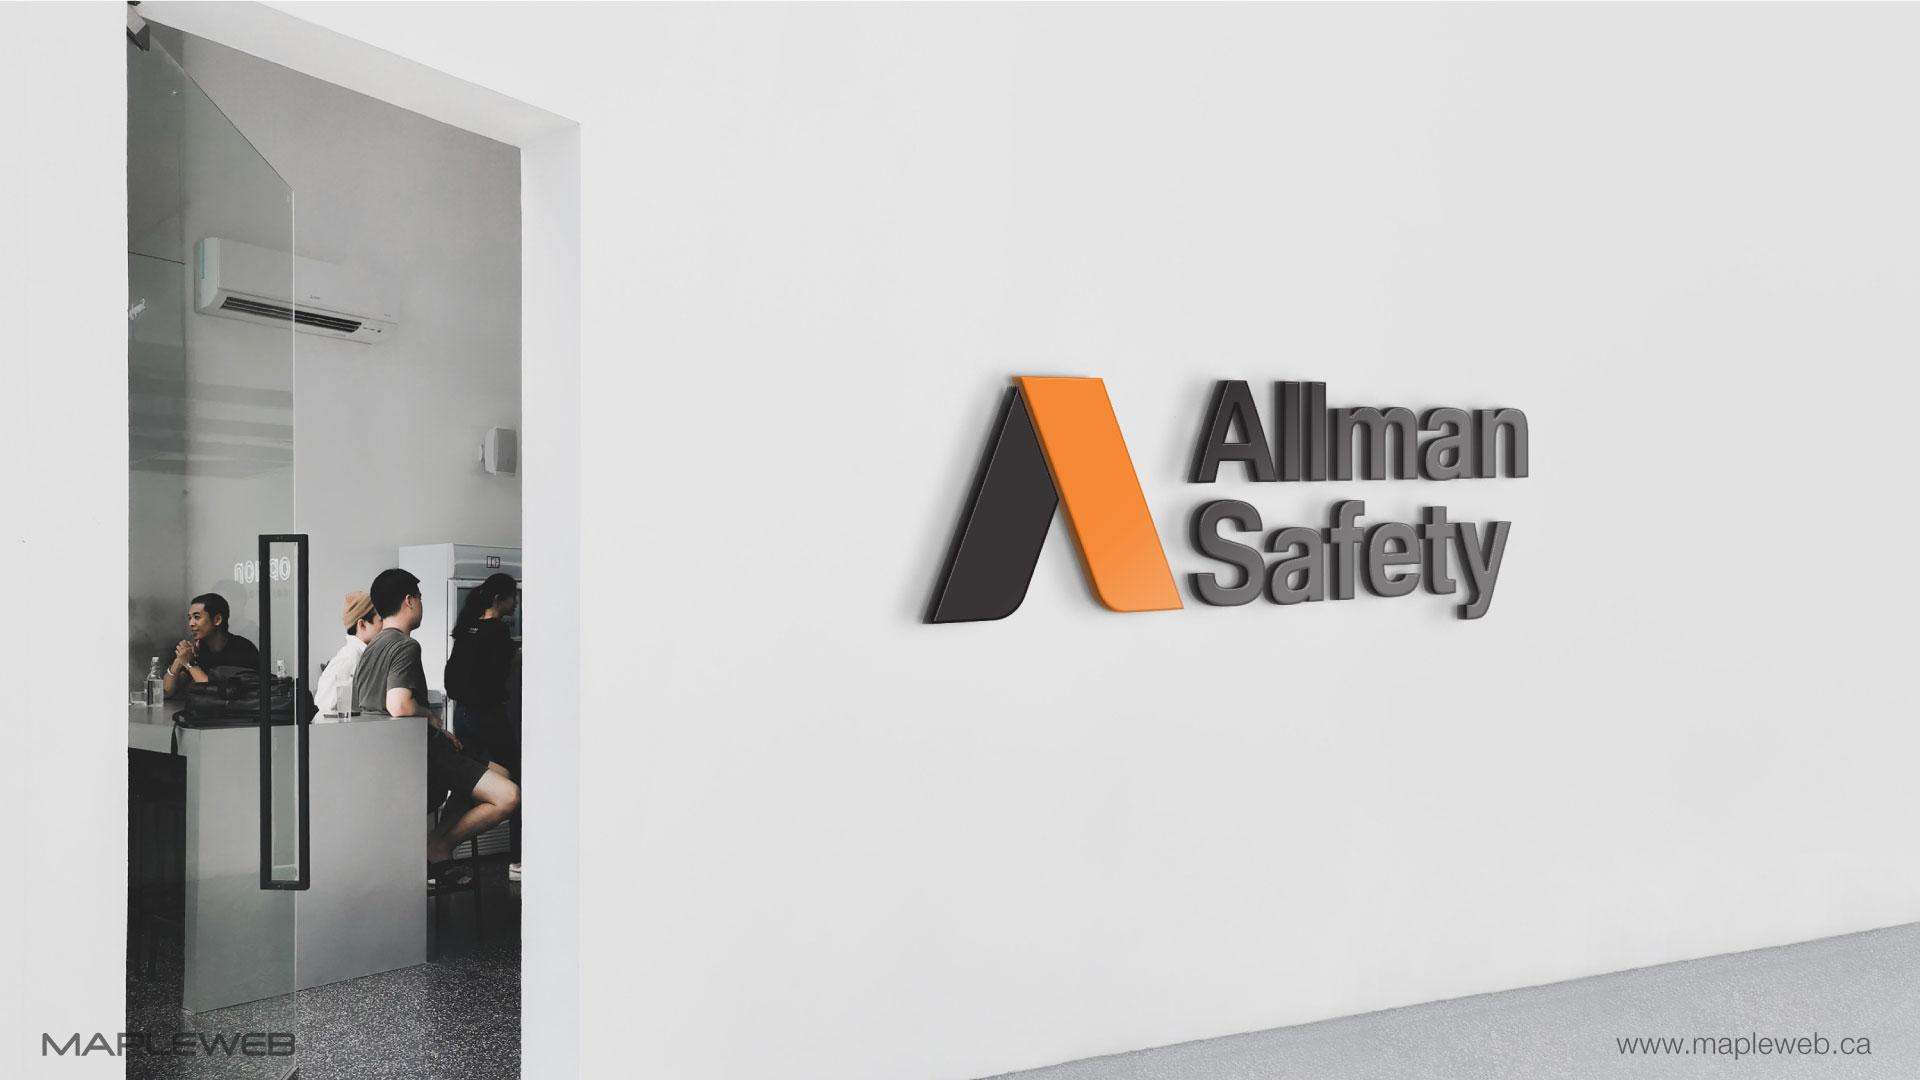 allman-safety-brand-logo-design-by-mapleweb-vancouver-canada-wall-mock